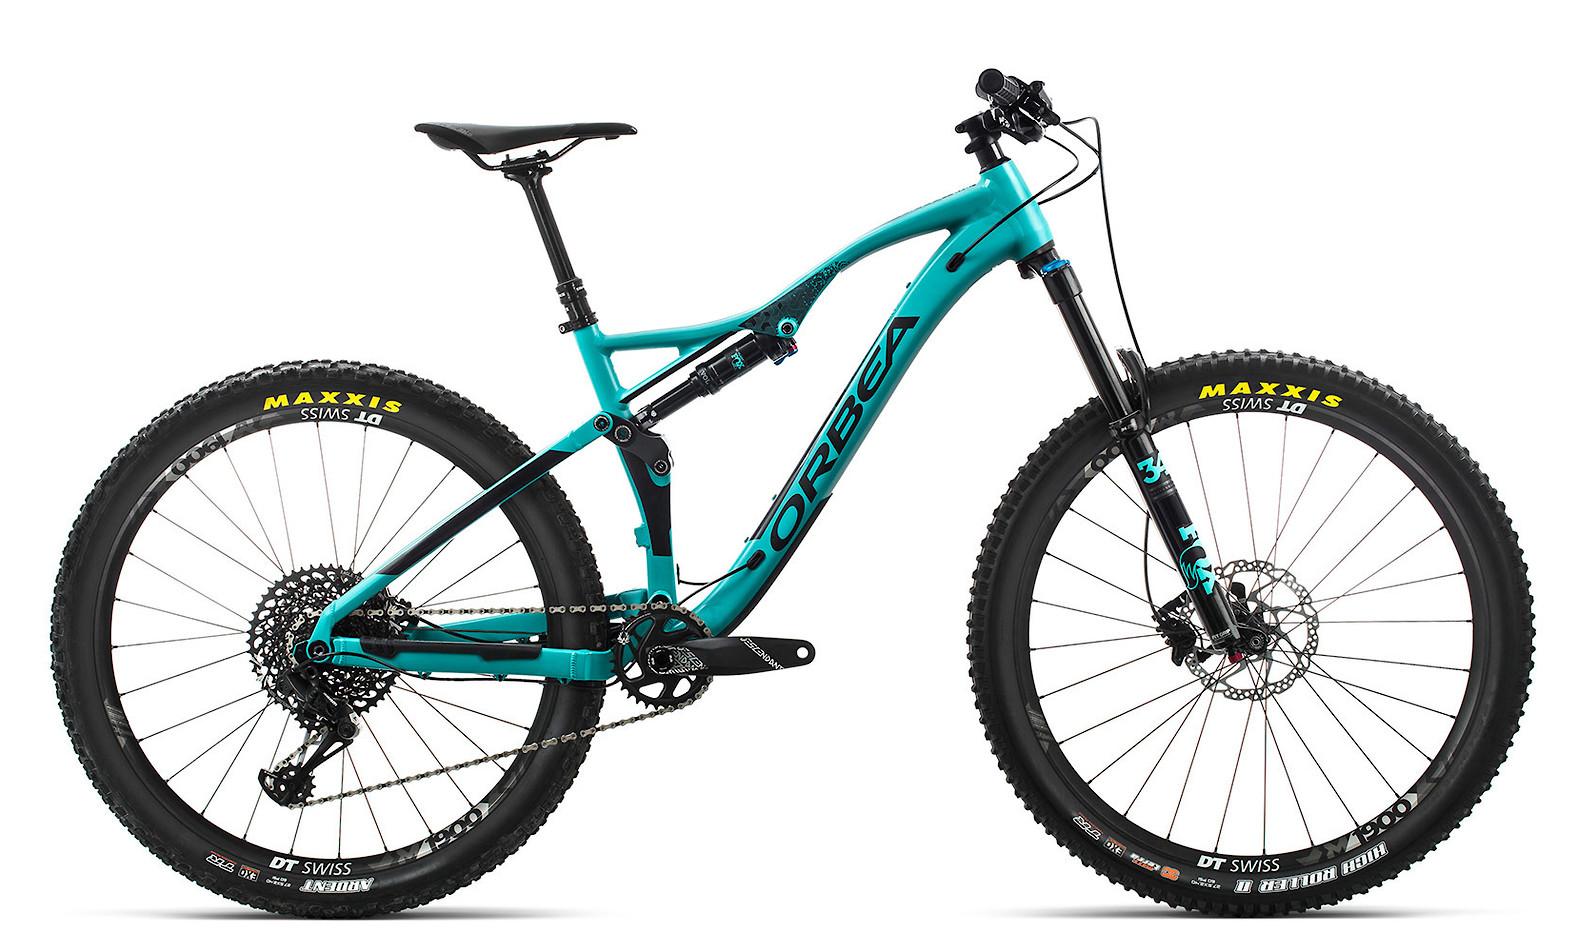 2019 Orbea Occam AM H10 Bike